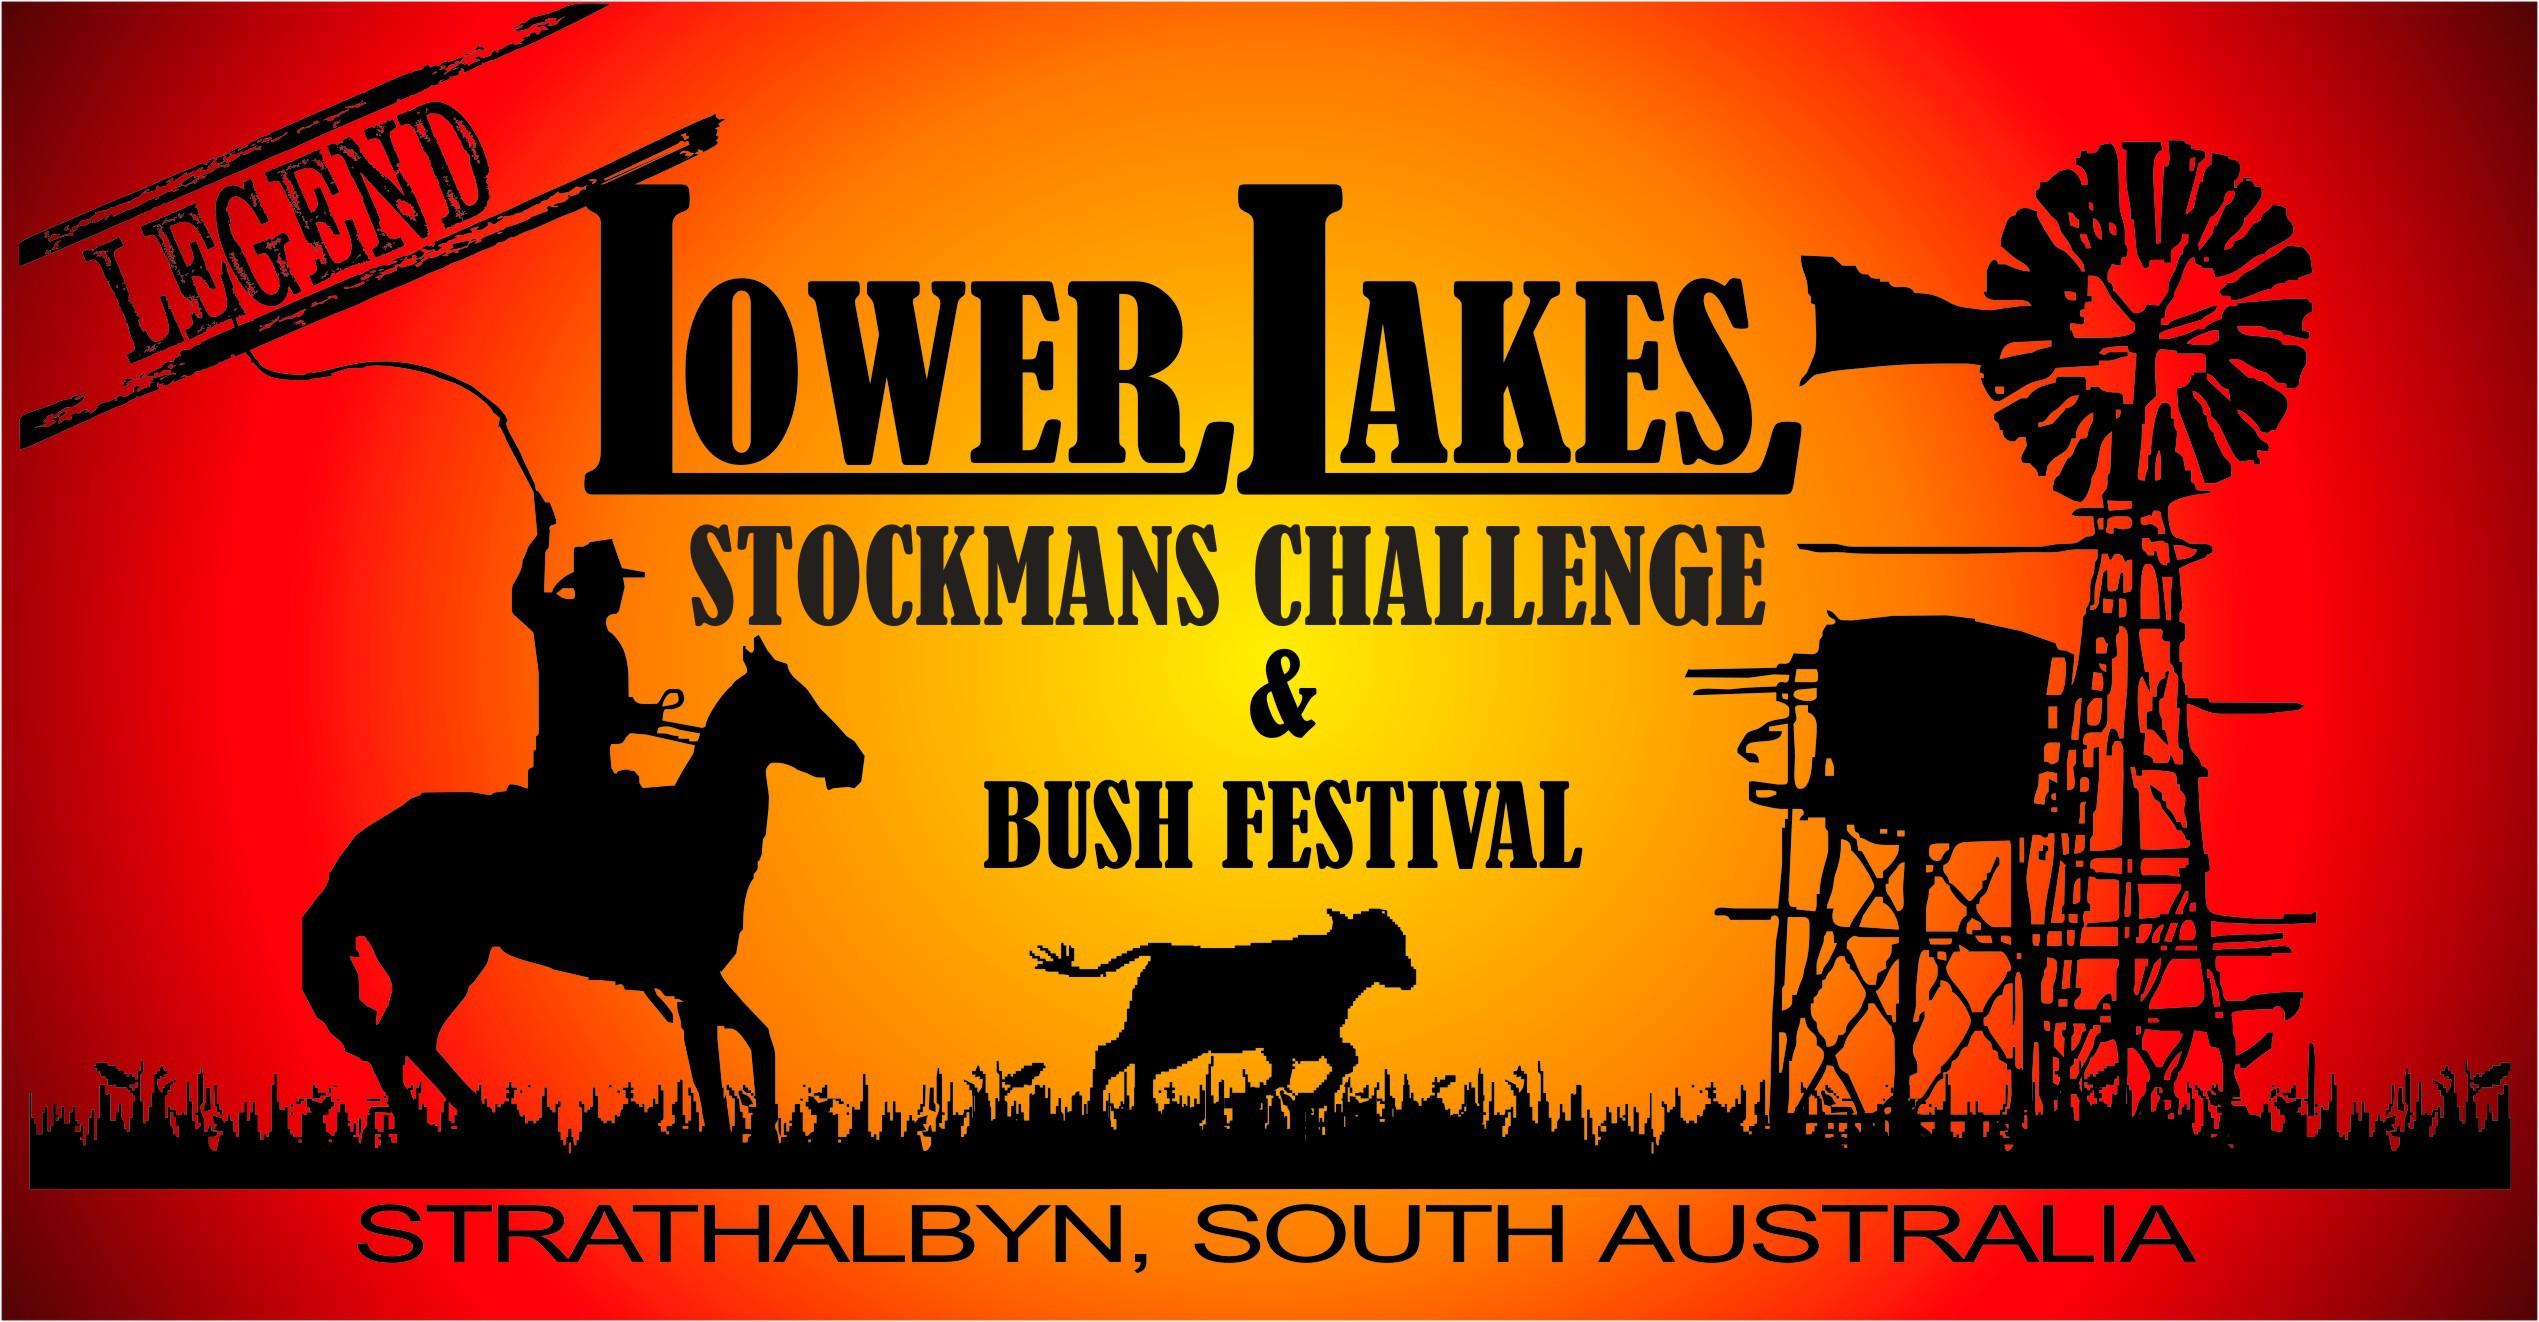 Lakes Challenge logo